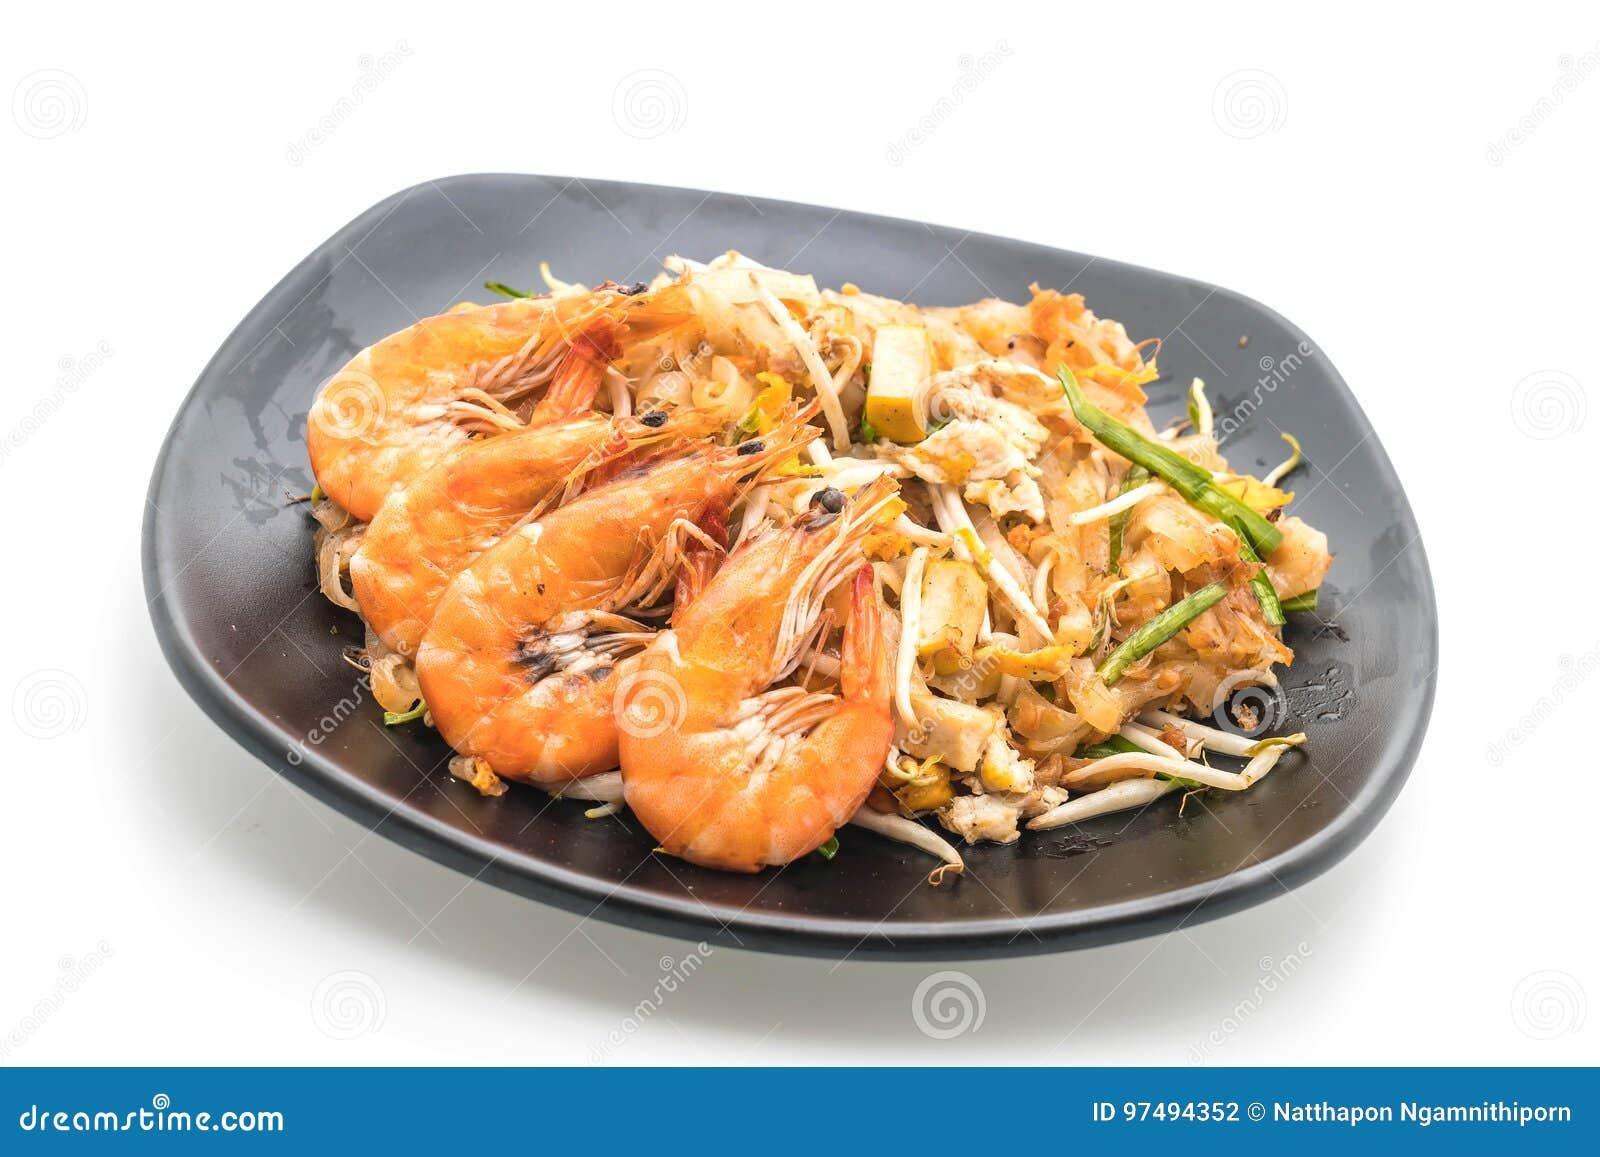 Fried Noodles Pad Thai tailandese con i gamberetti o i gamberetti